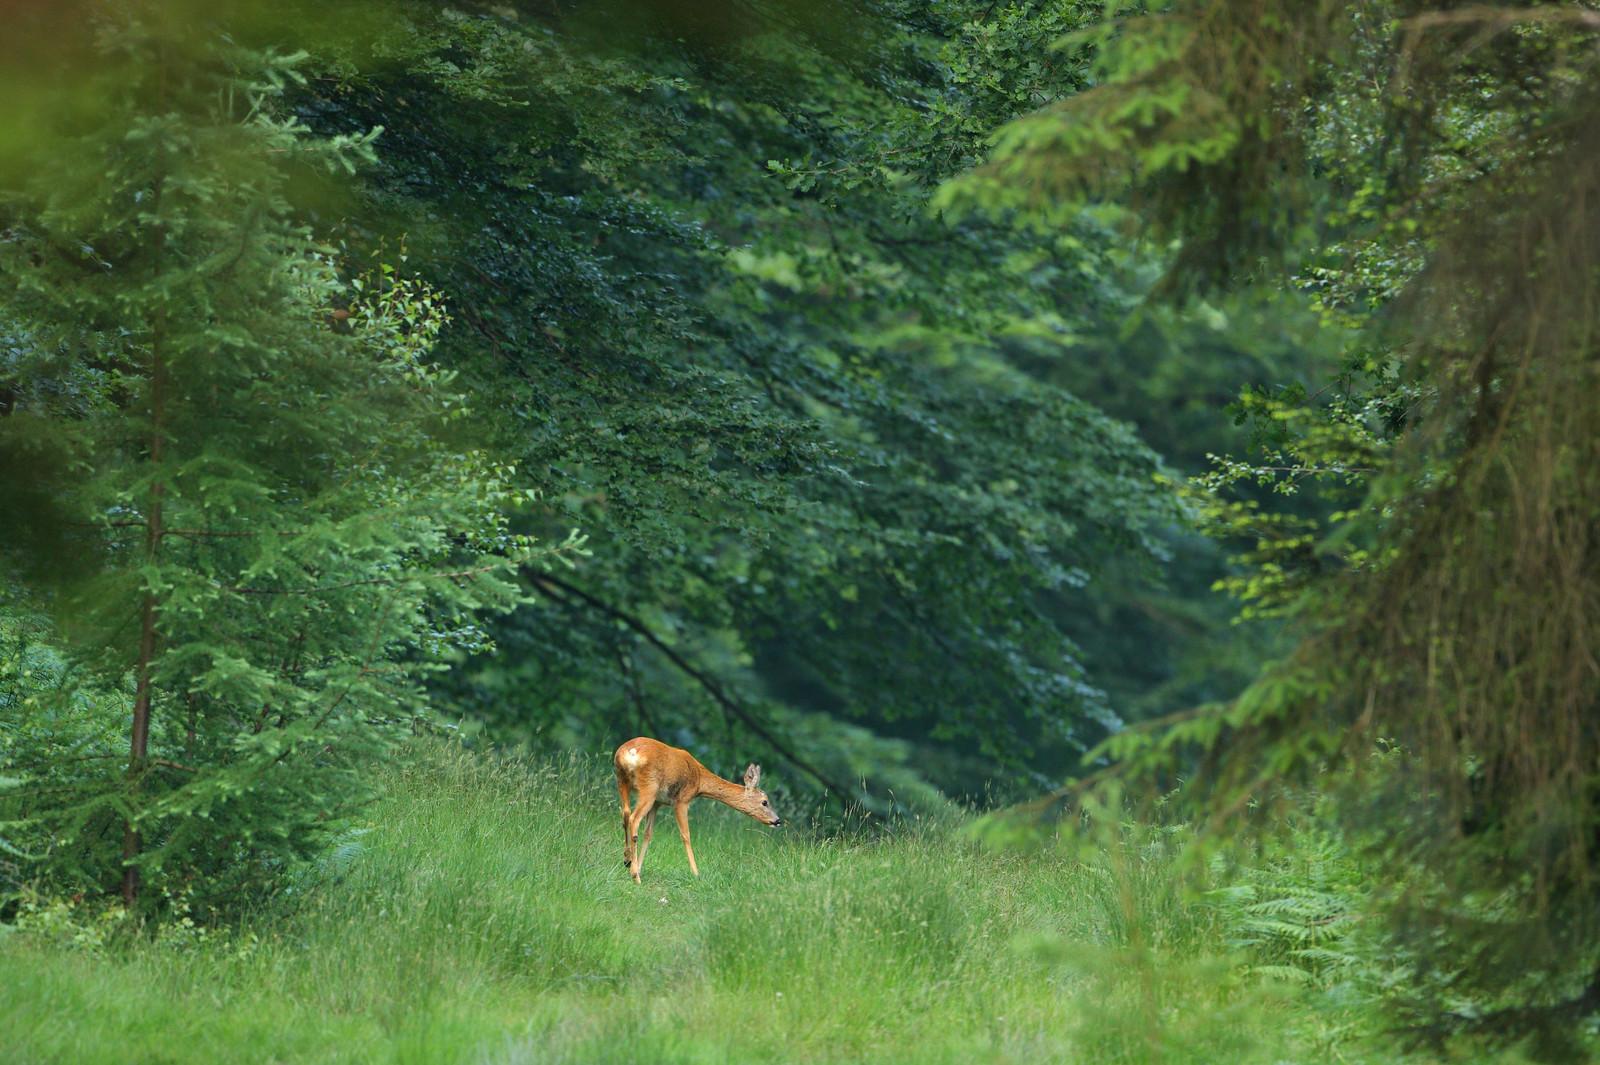 Roe deer in Forest Glade